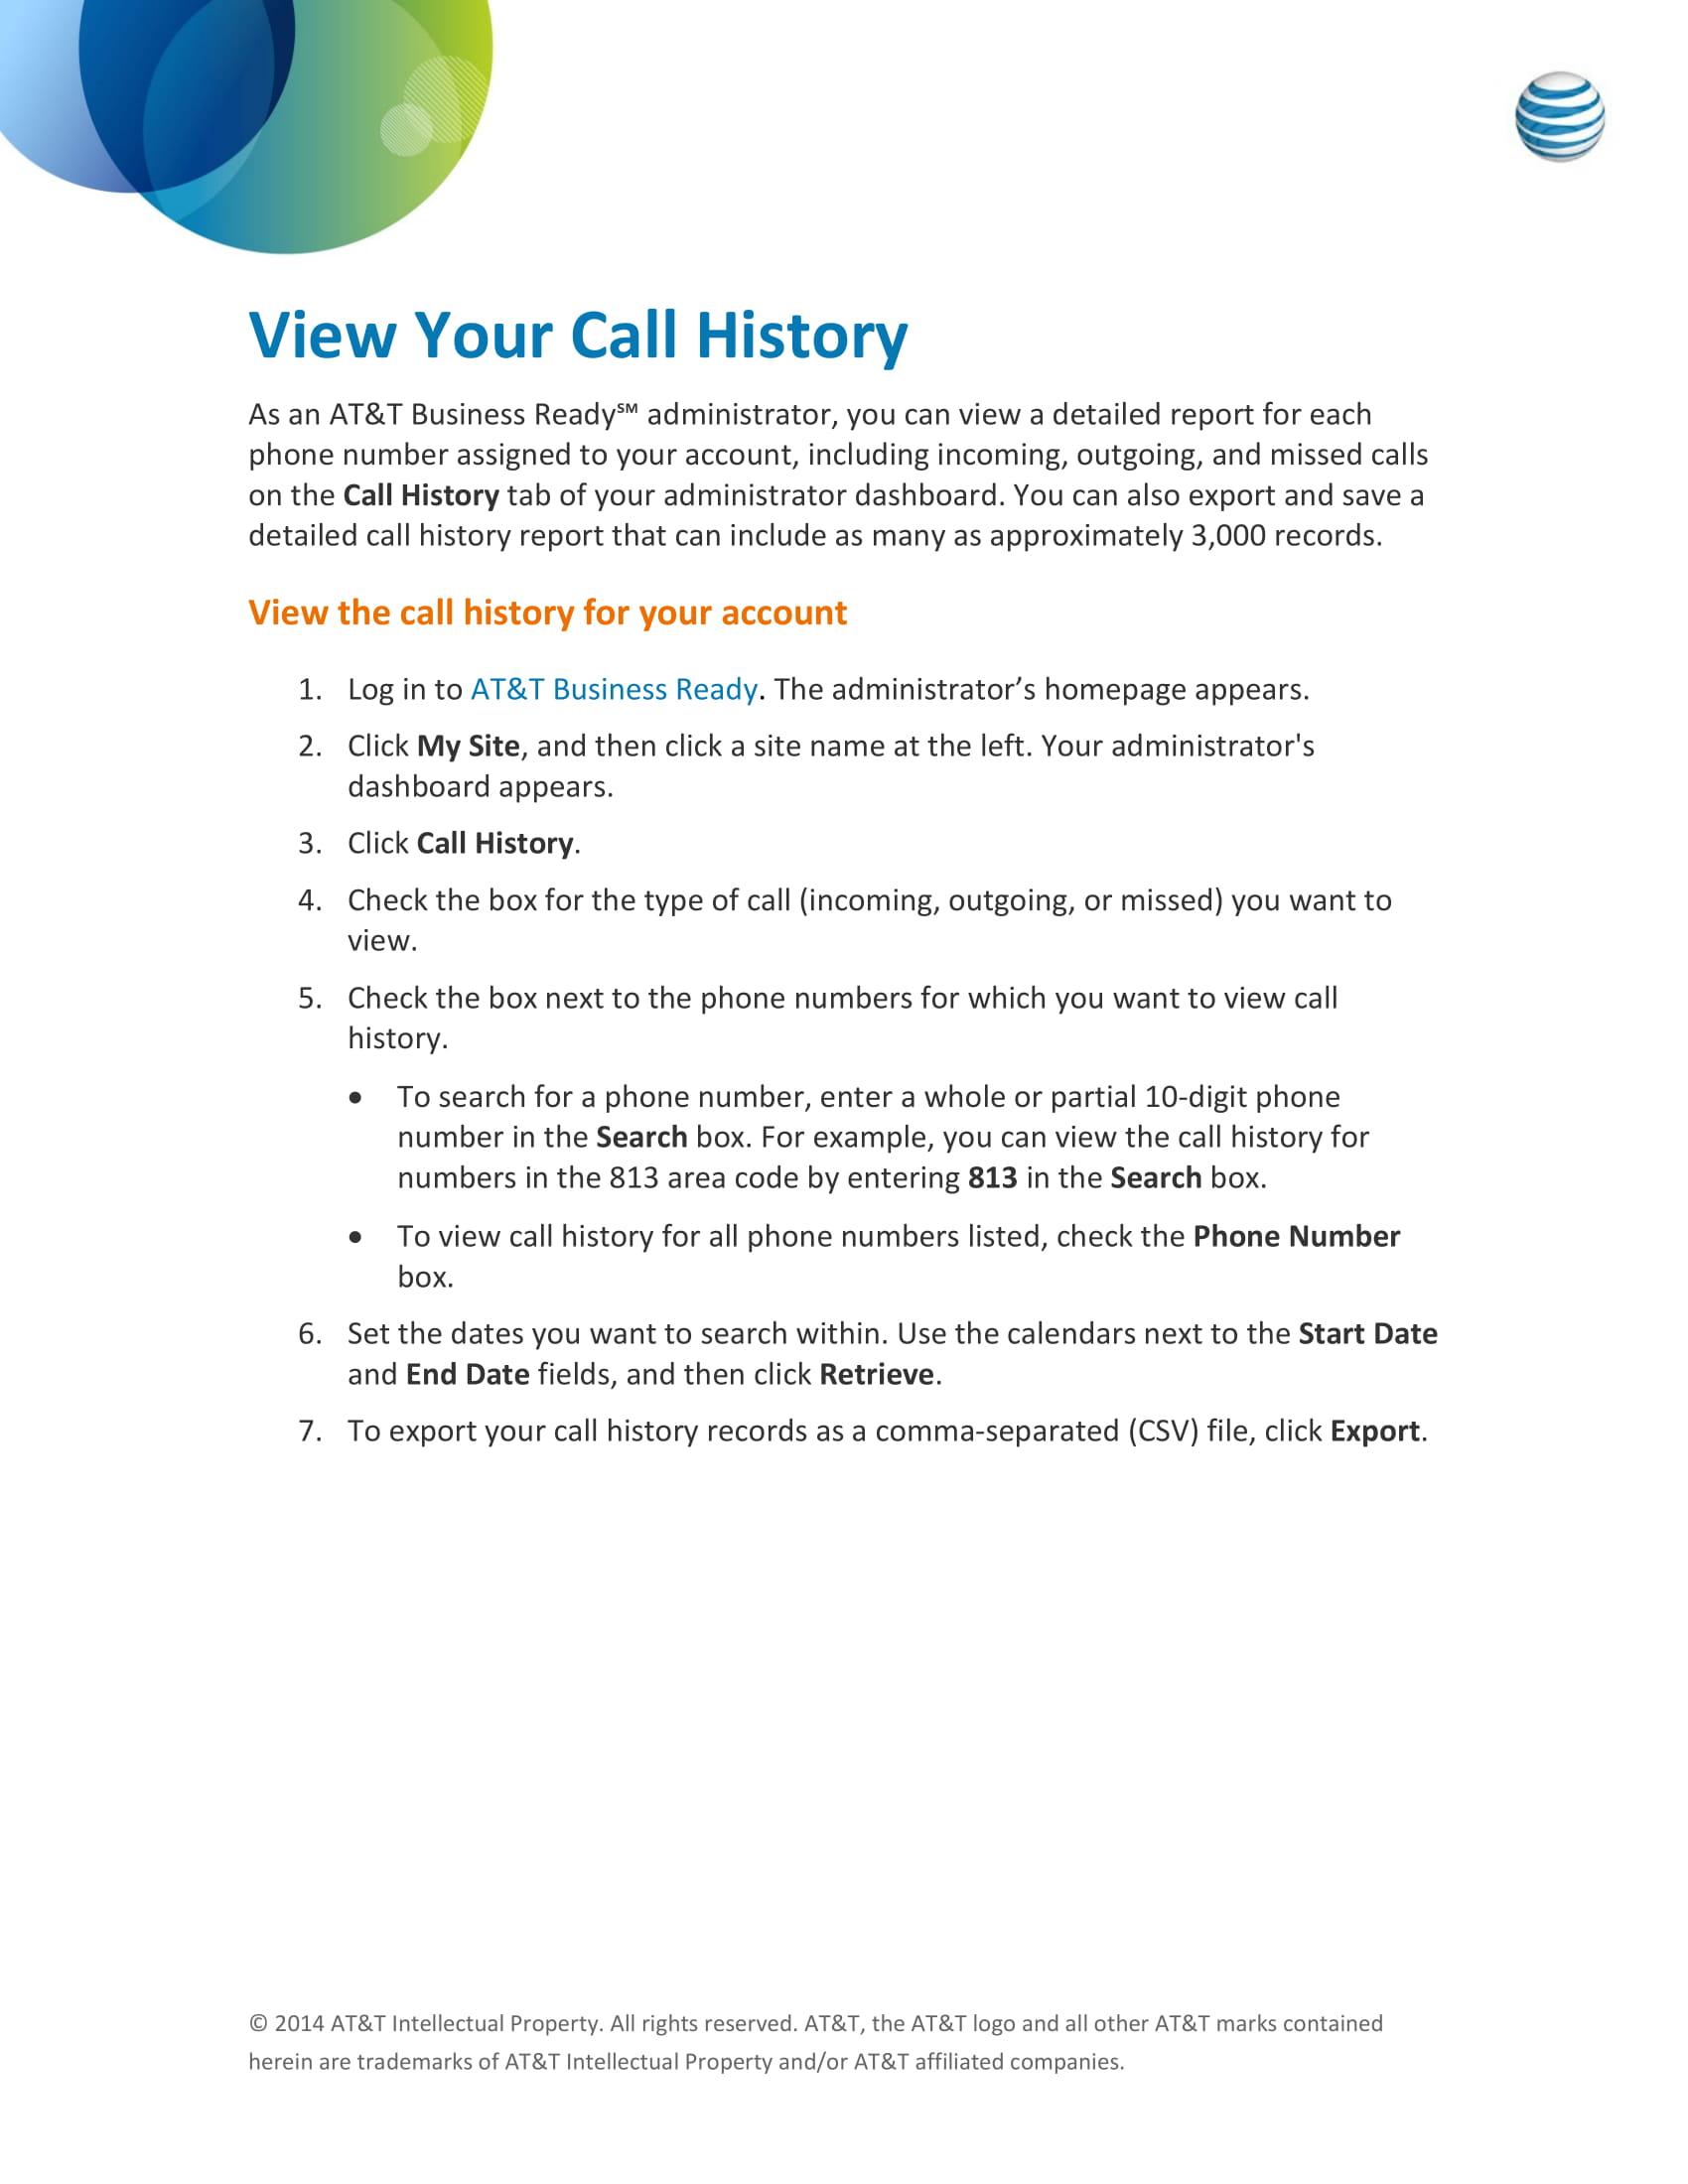 call log history example 1